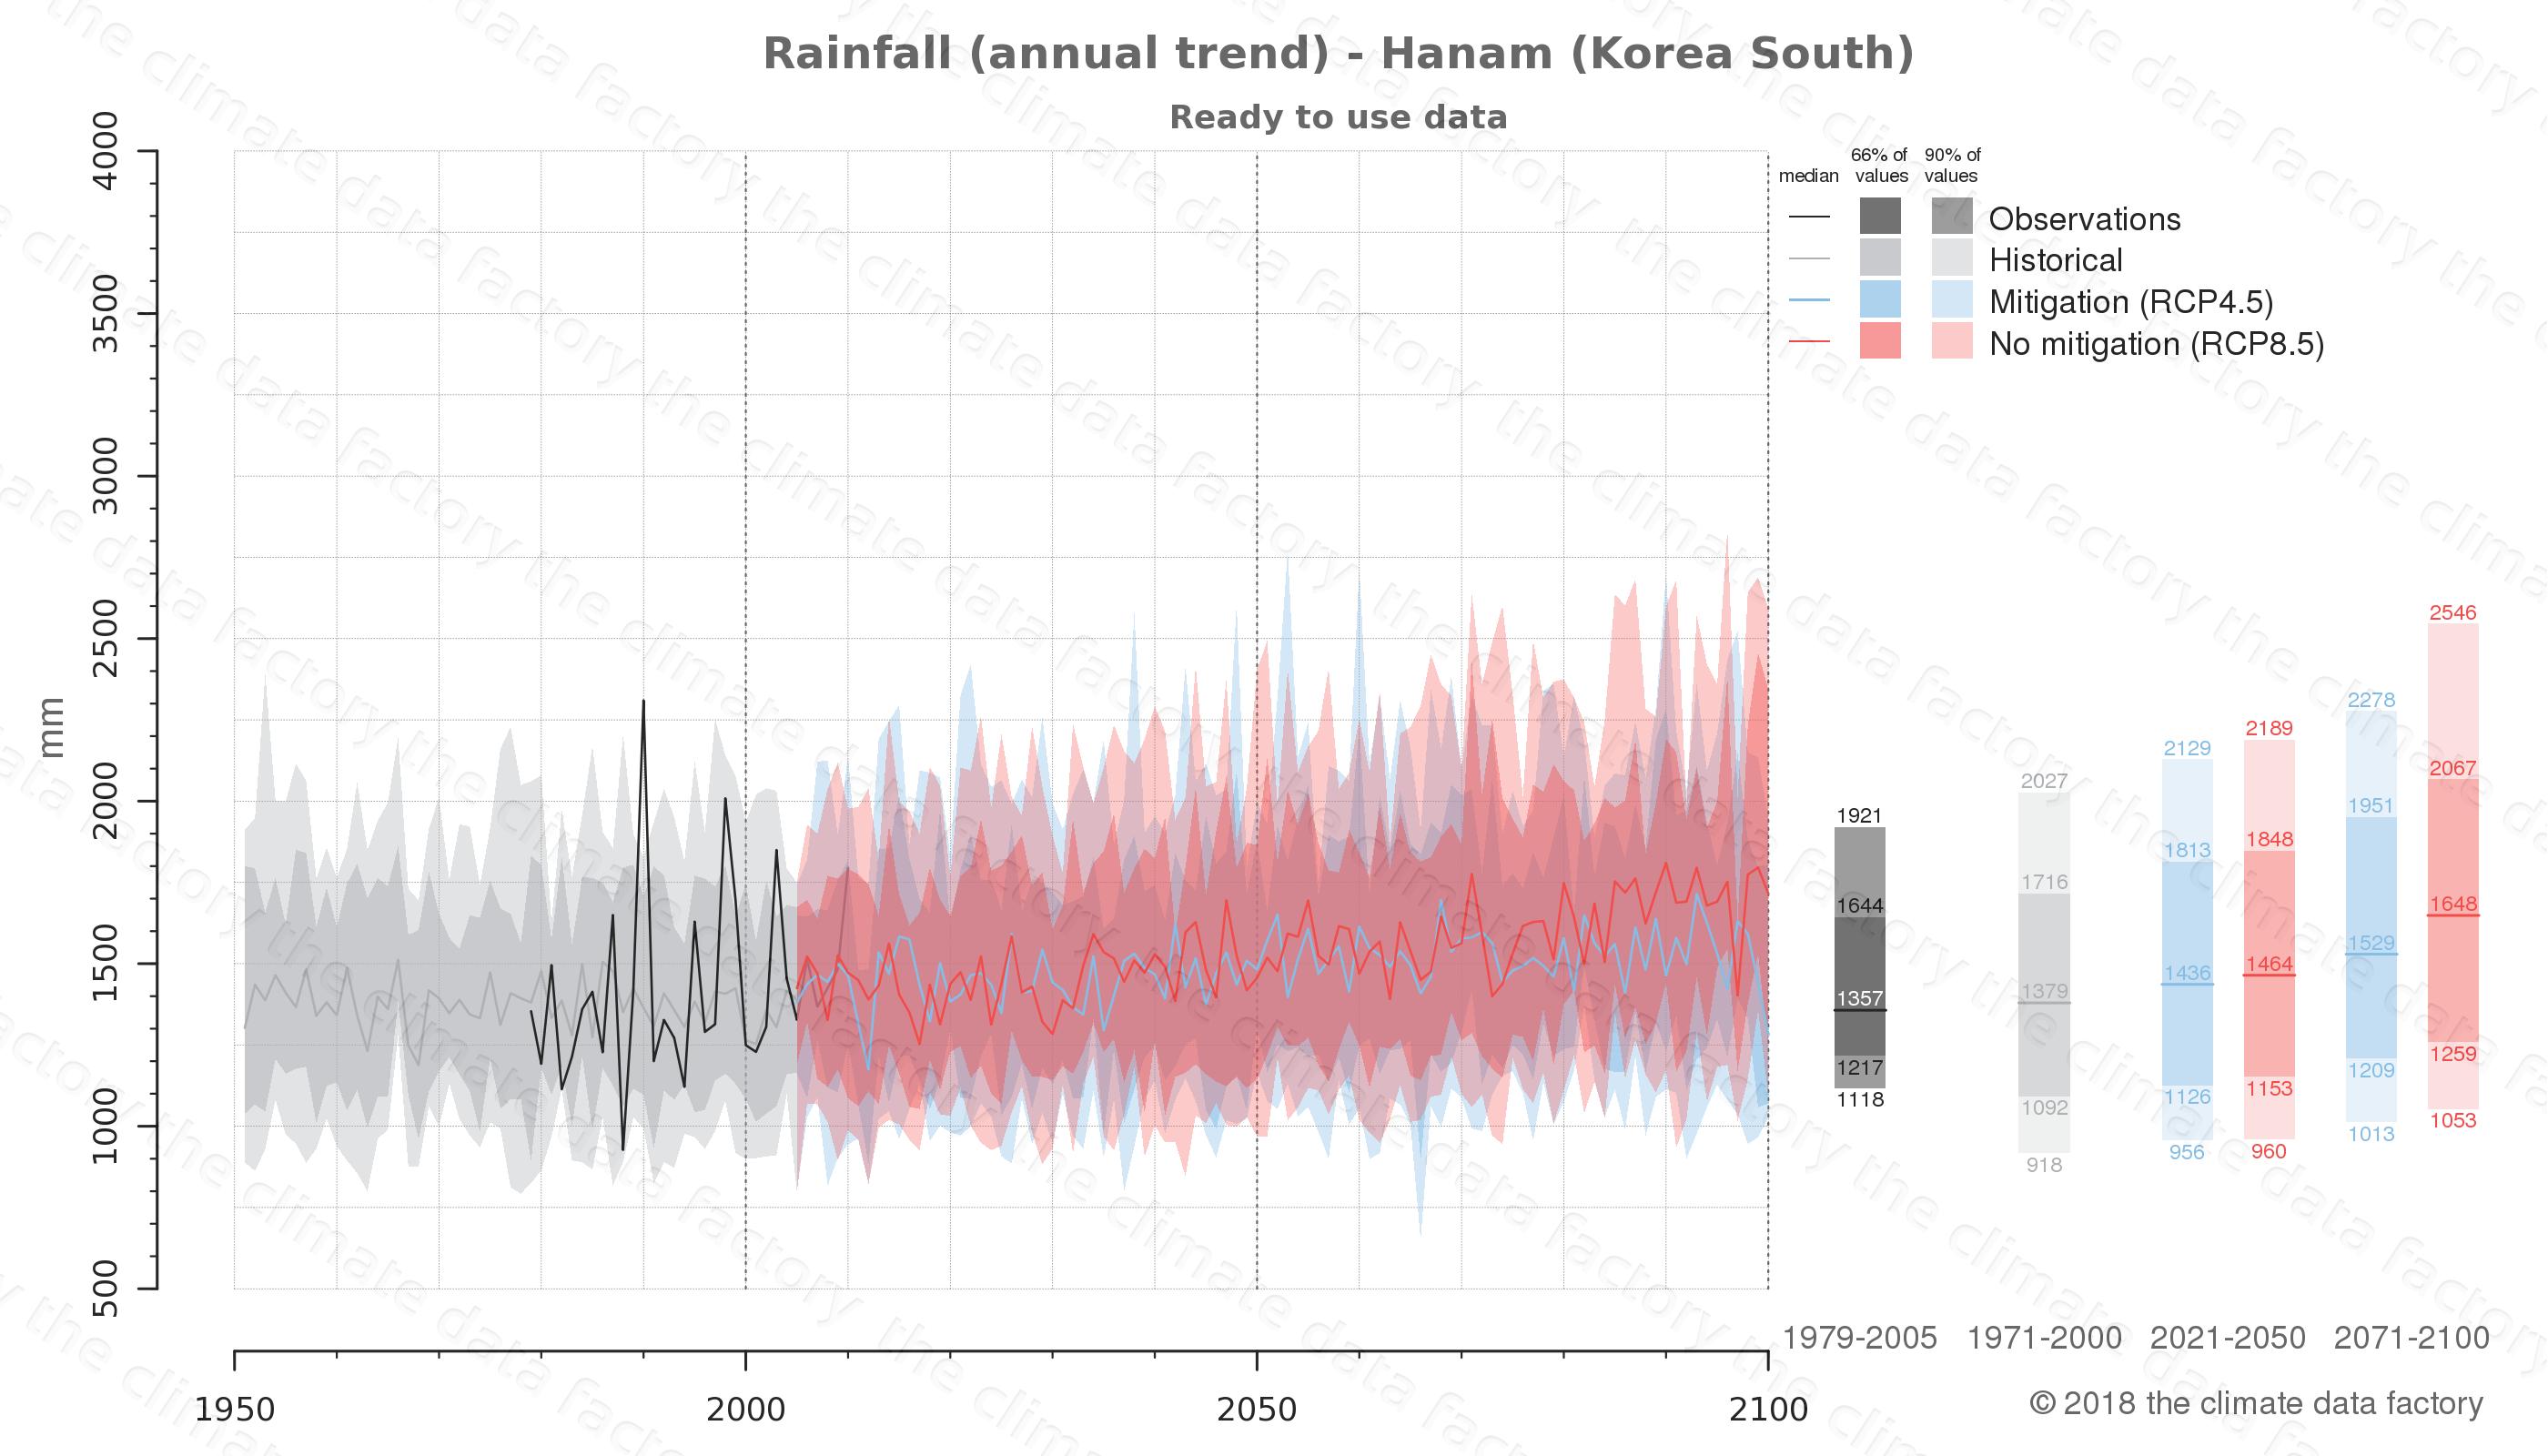 climate change data policy adaptation climate graph city data rainfall hanam south korea